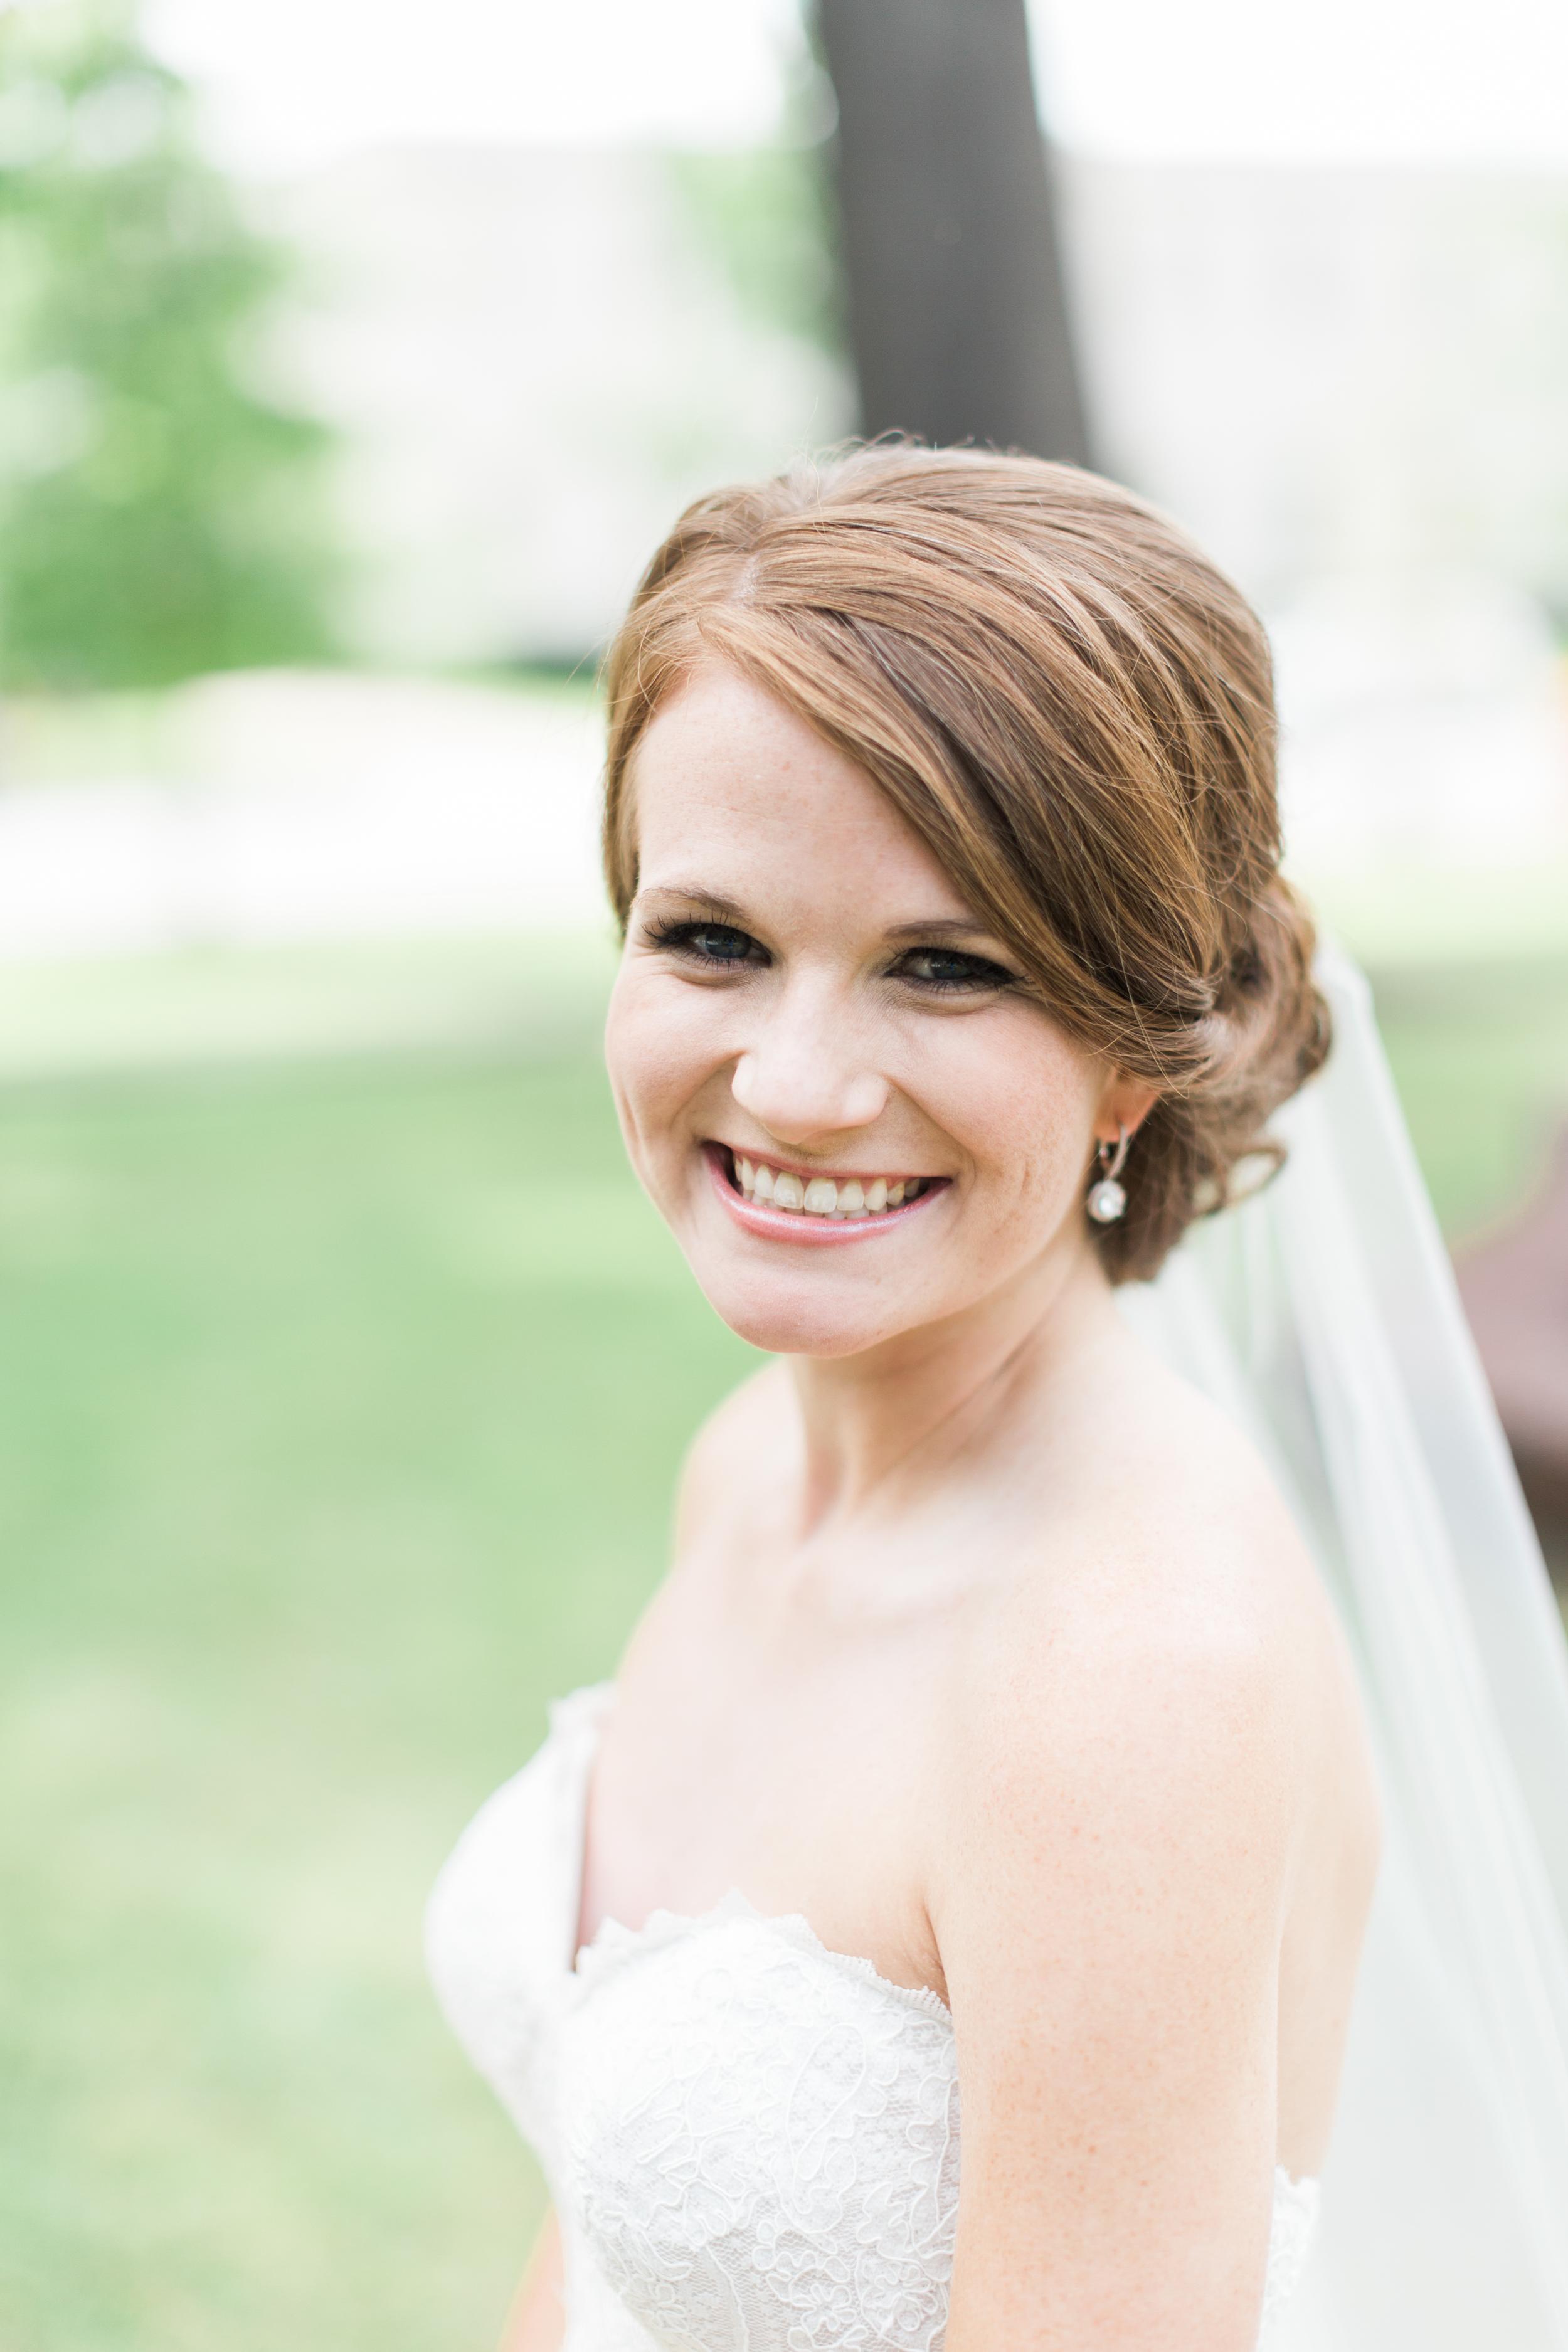 Brewbaker-Wedding-Montgomery-Alabama-Nick-Drollette-107.jpg